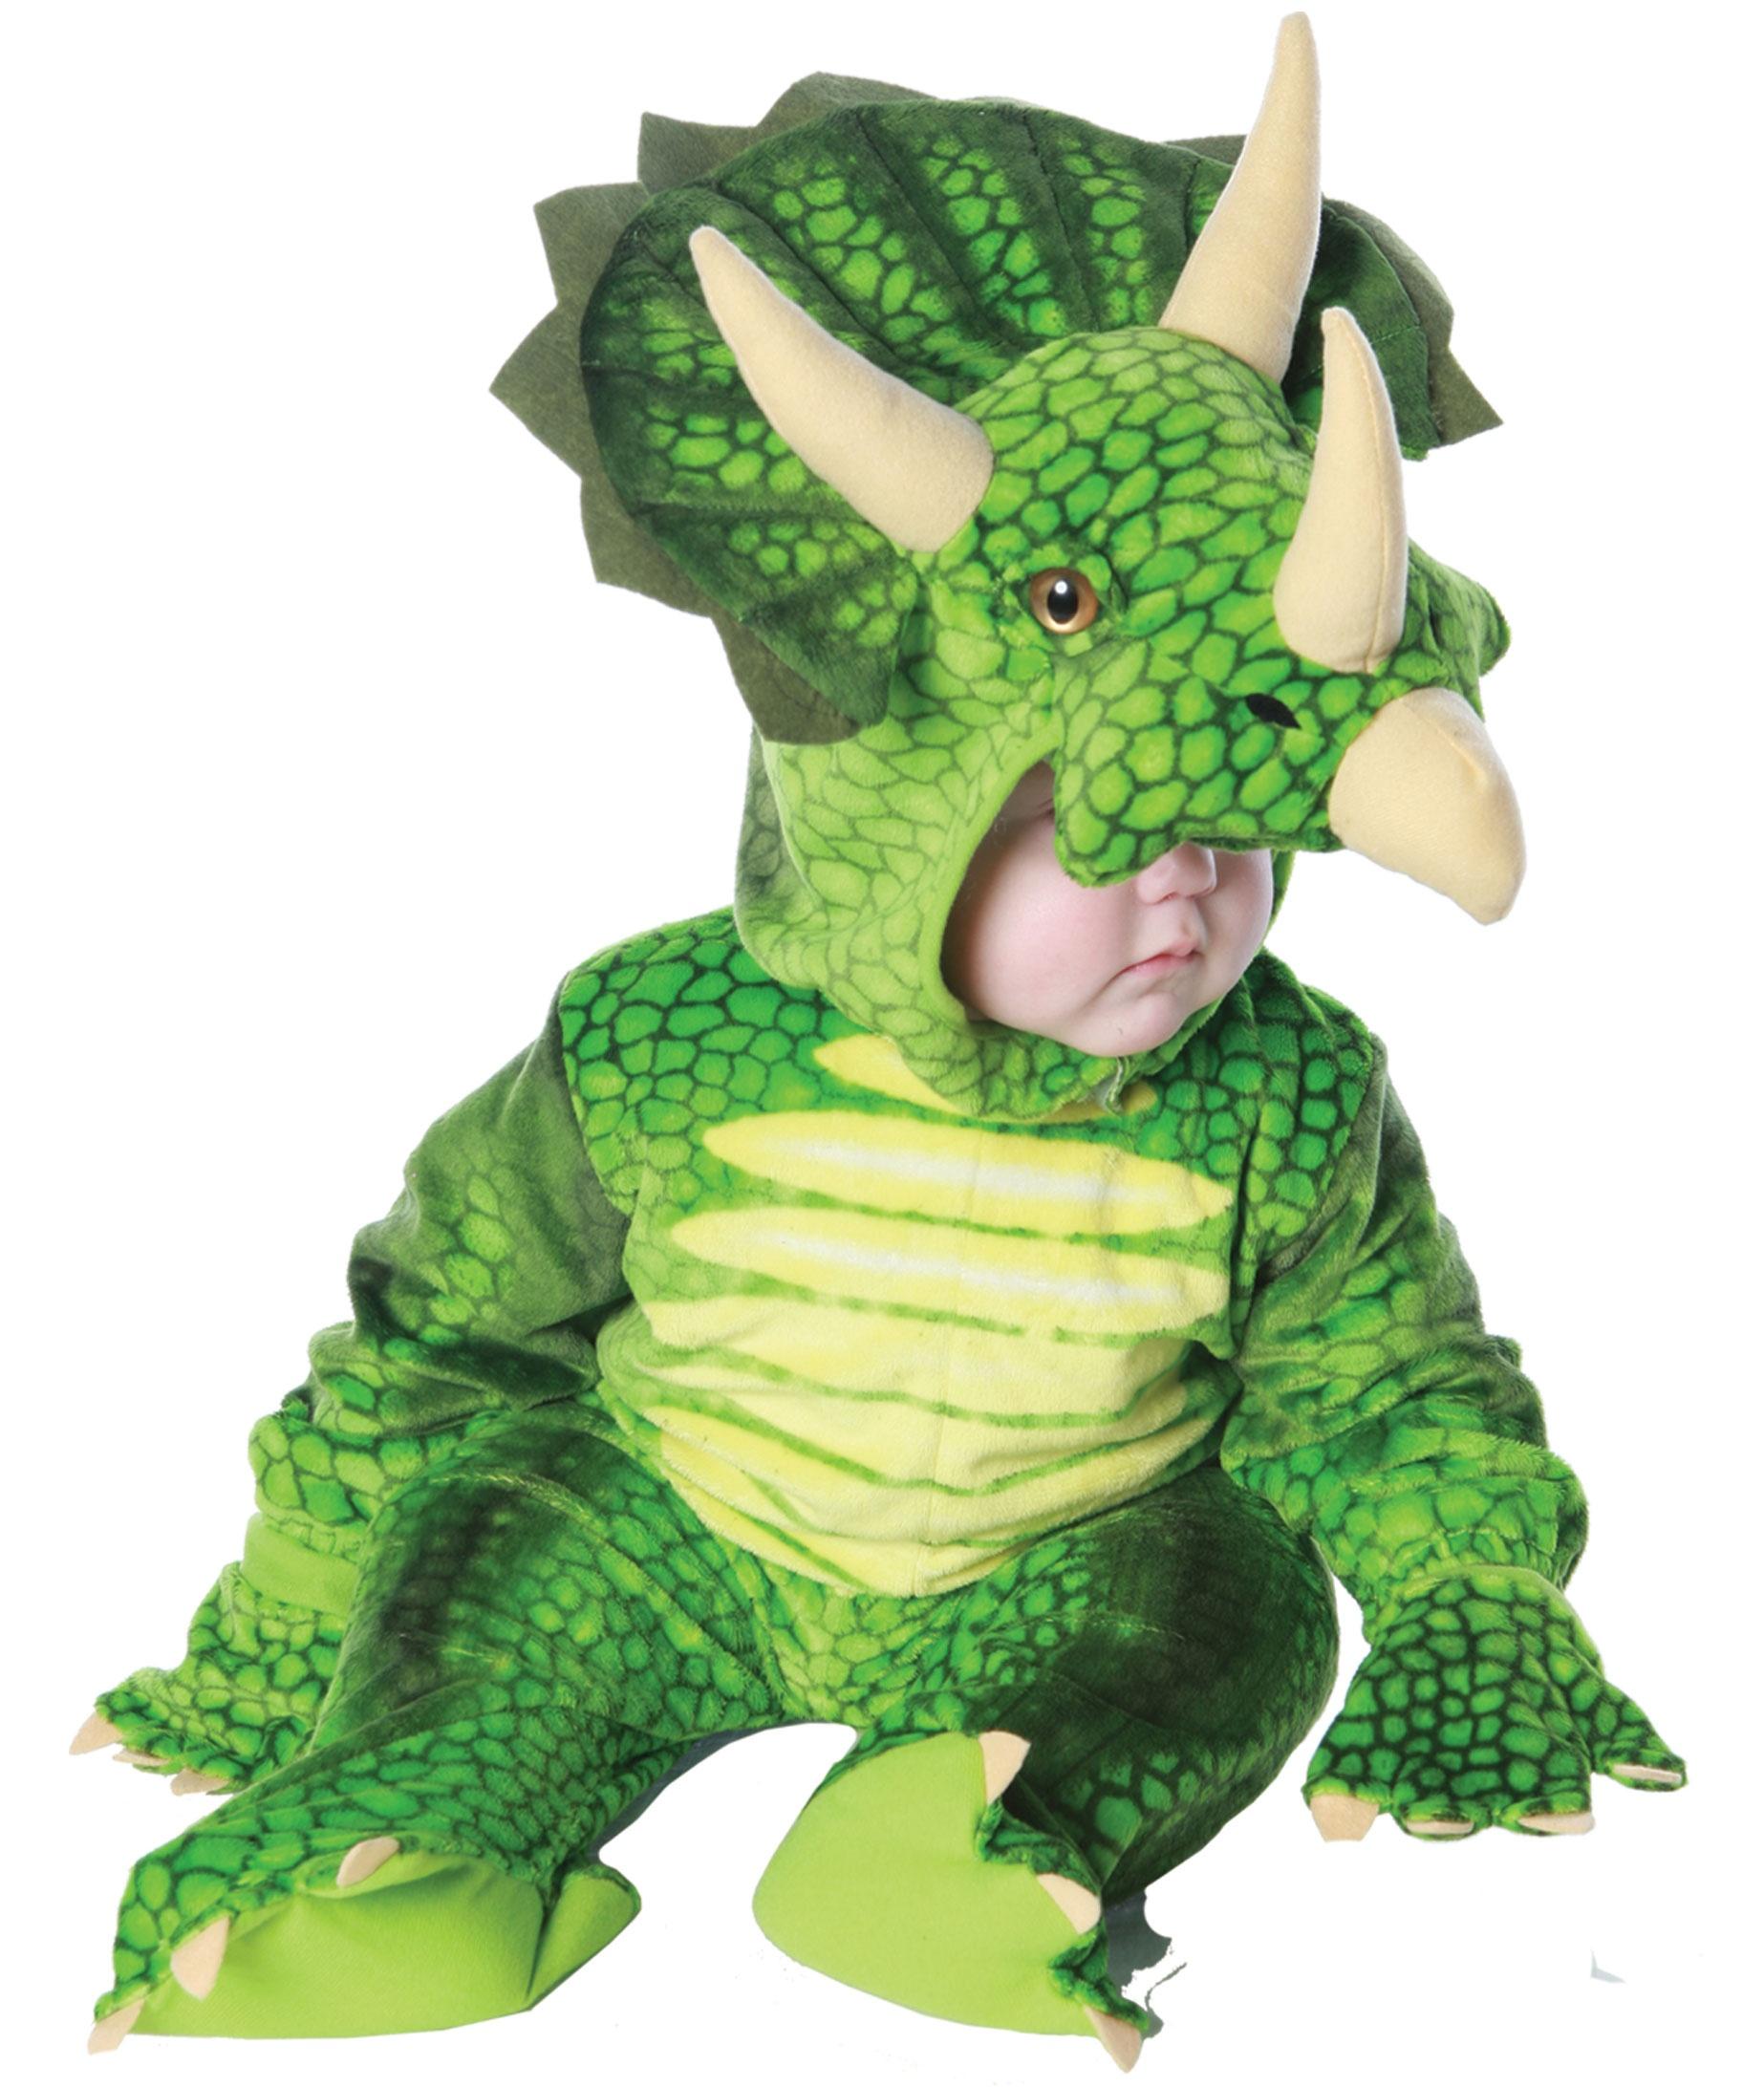 Boys Green Triceratops Dinosaur Kids Costume Costumes